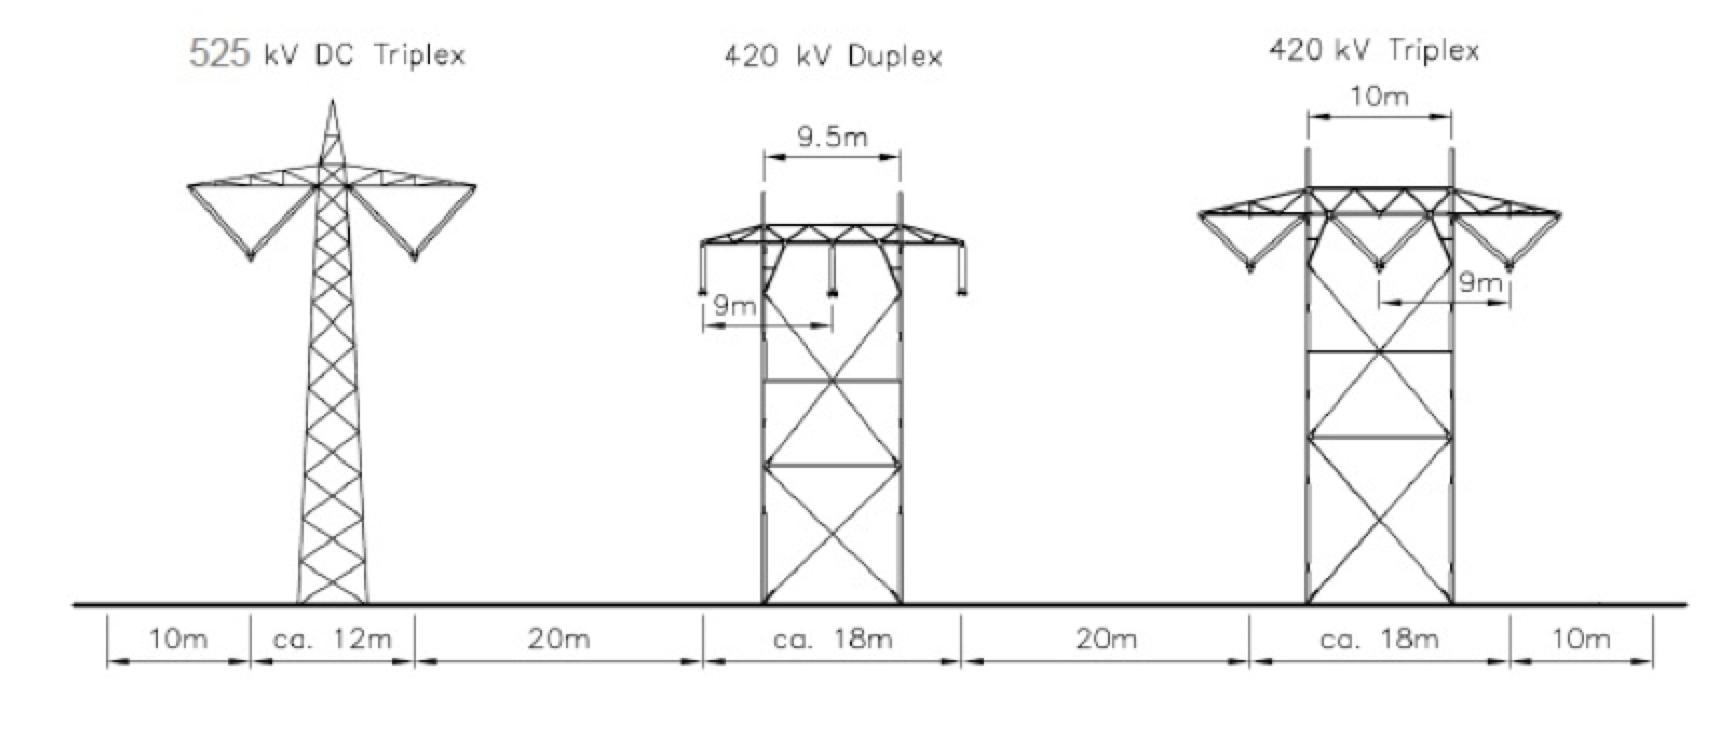 HVDC Line hvdc line Design & Installation of Composite Insulators for New ±525 kV DC Line Screen Shot 2017 09 22 at 09